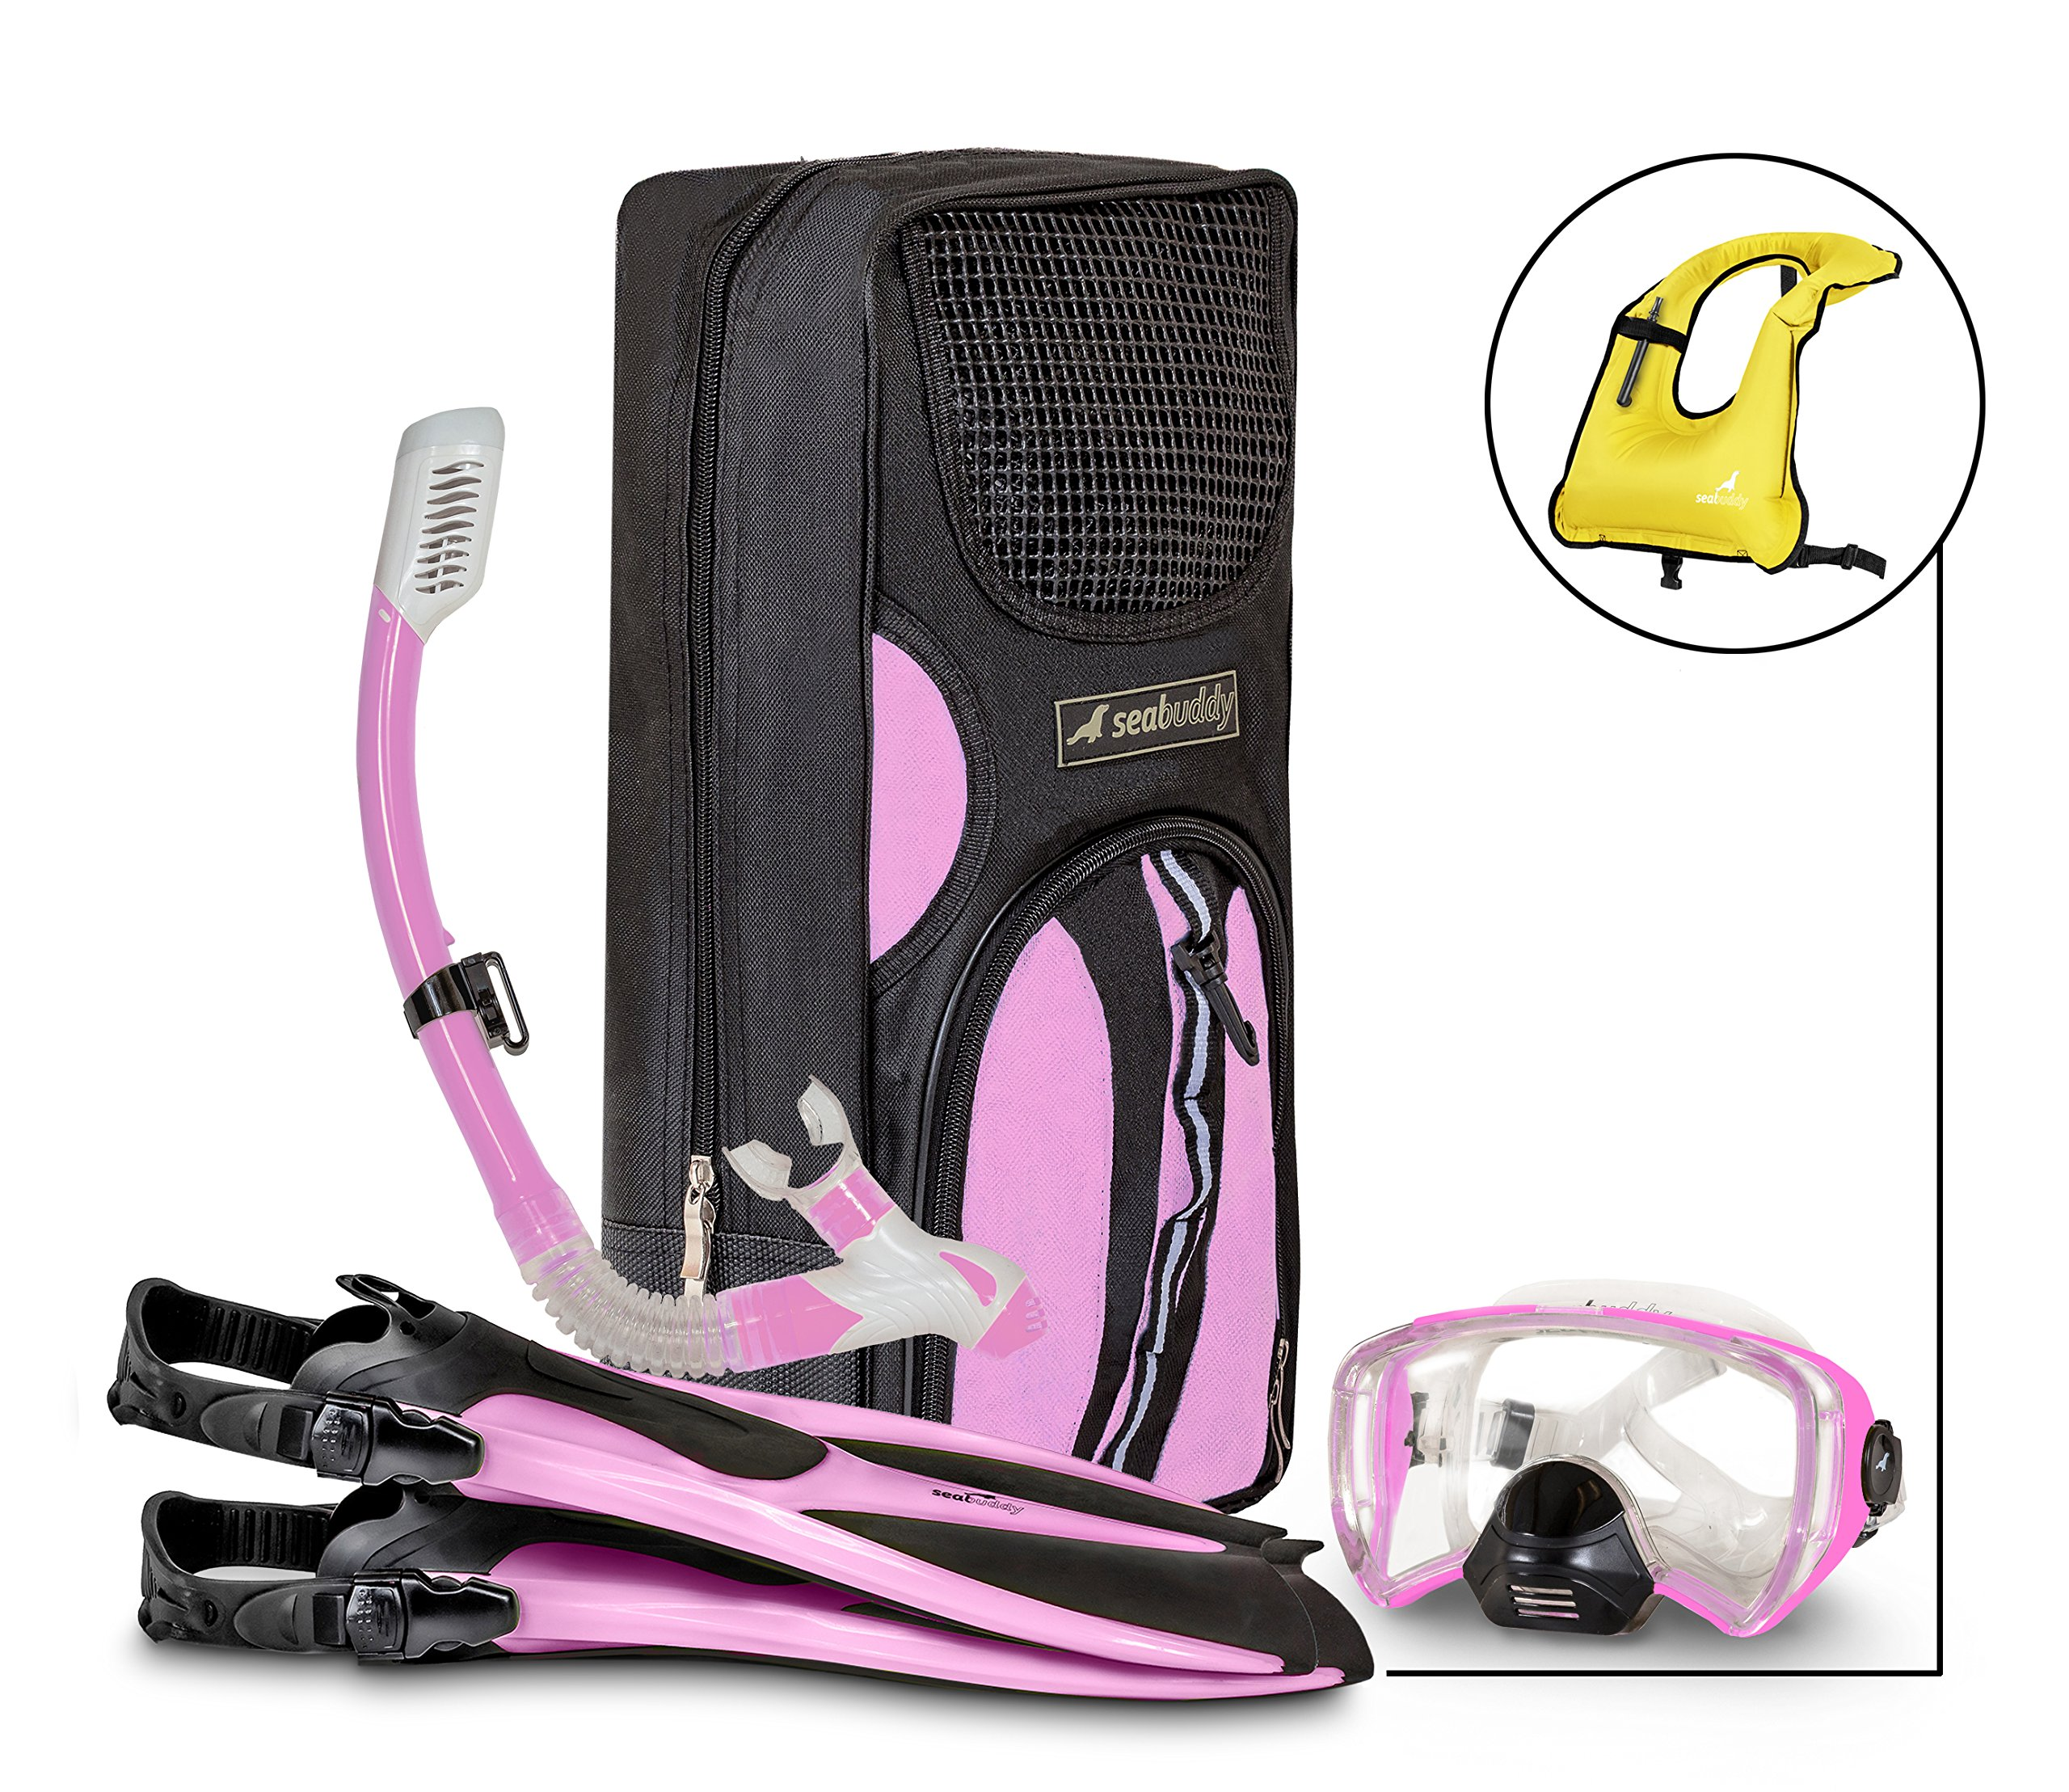 SealBuddy Fiji Panoramic Snorkel Set + Premium Travel Gear Bag ~ Vest Included (Pink/Black, S/M Size 4 to 7.5) by SealBuddy